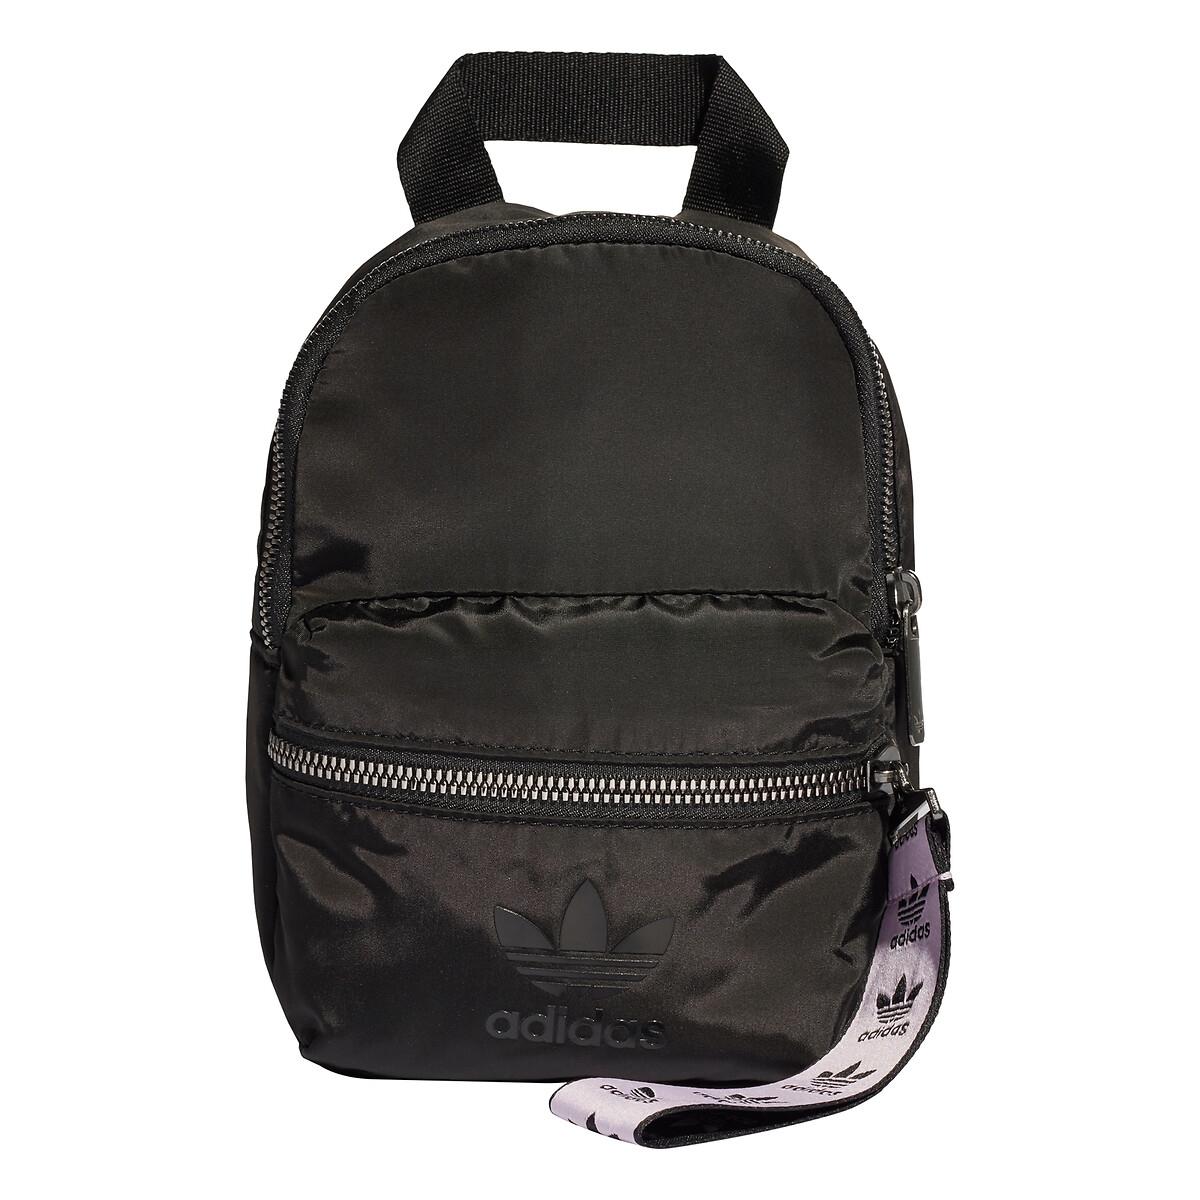 An image of Adidas Originals Girls Bp Mini Backpack